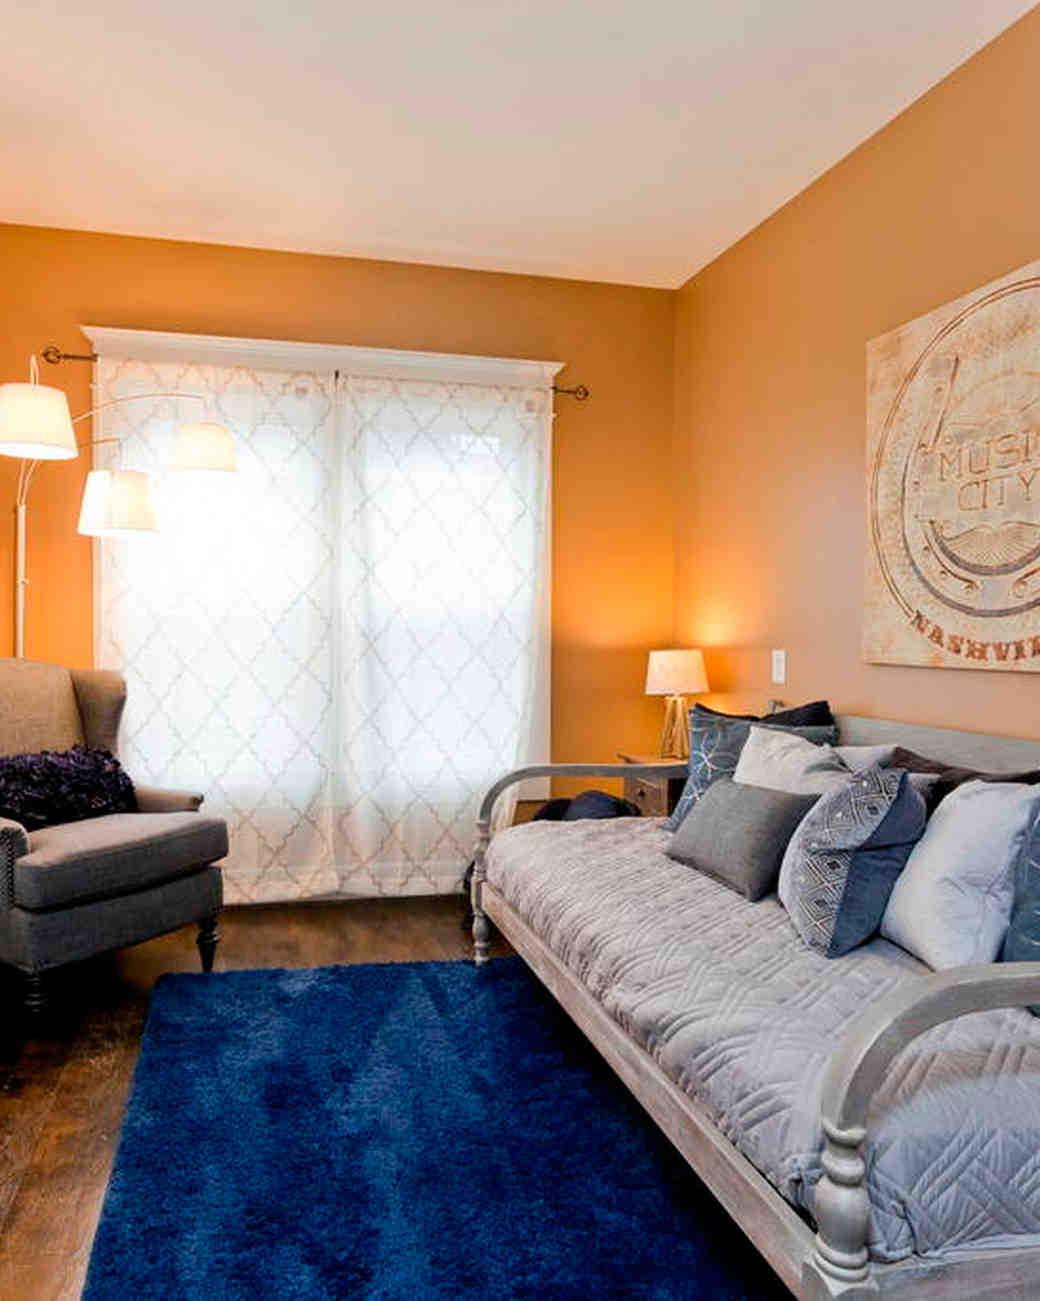 bachelorette-party-destinations-nashville-tennessee-airbnb-1215.jpg